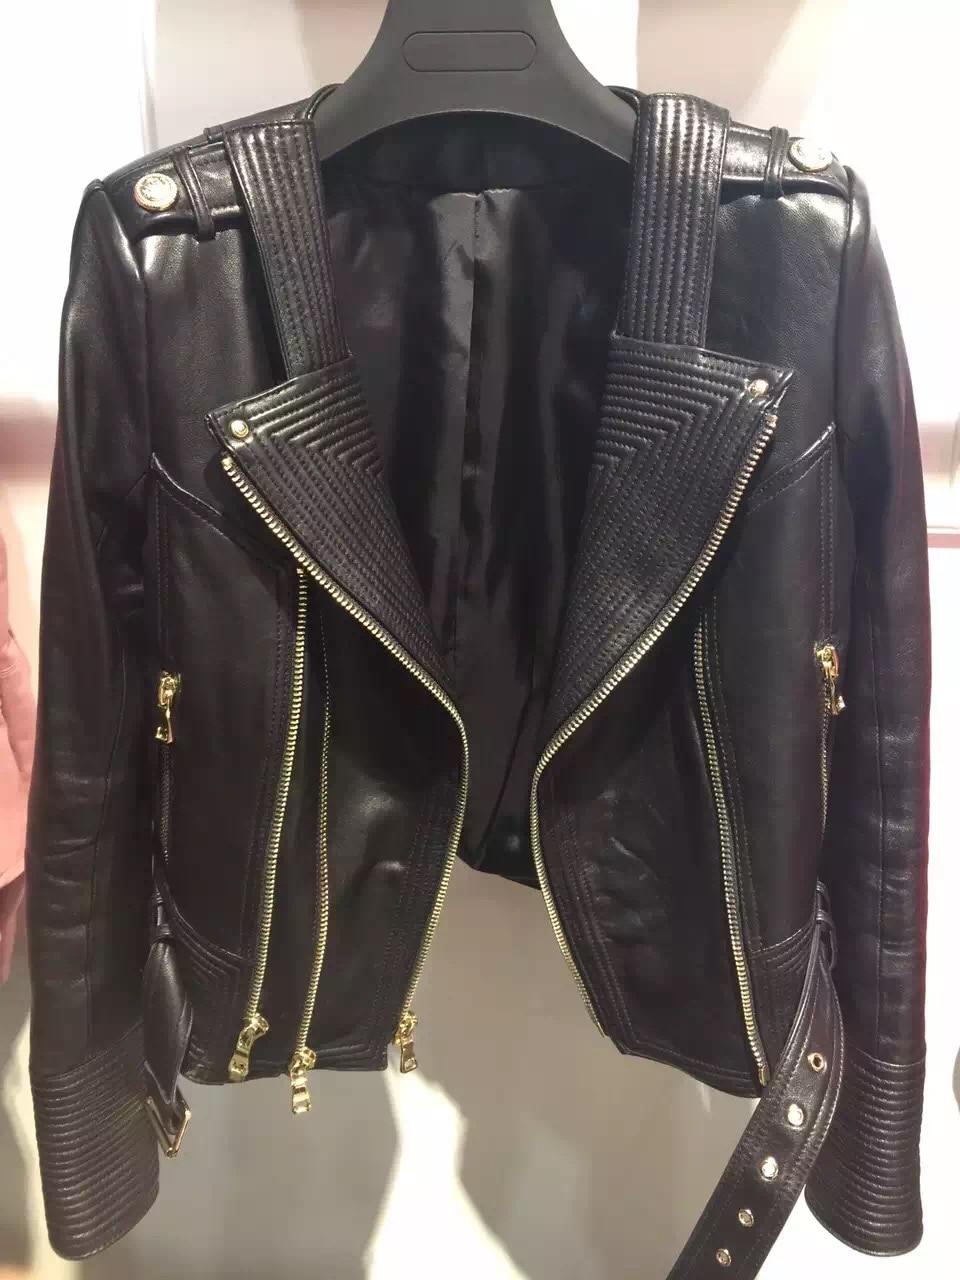 real leather jacket women leather jacket ladies genuine leather jacket|jackets ladies|jacket womenjackets women leather - AliExpress